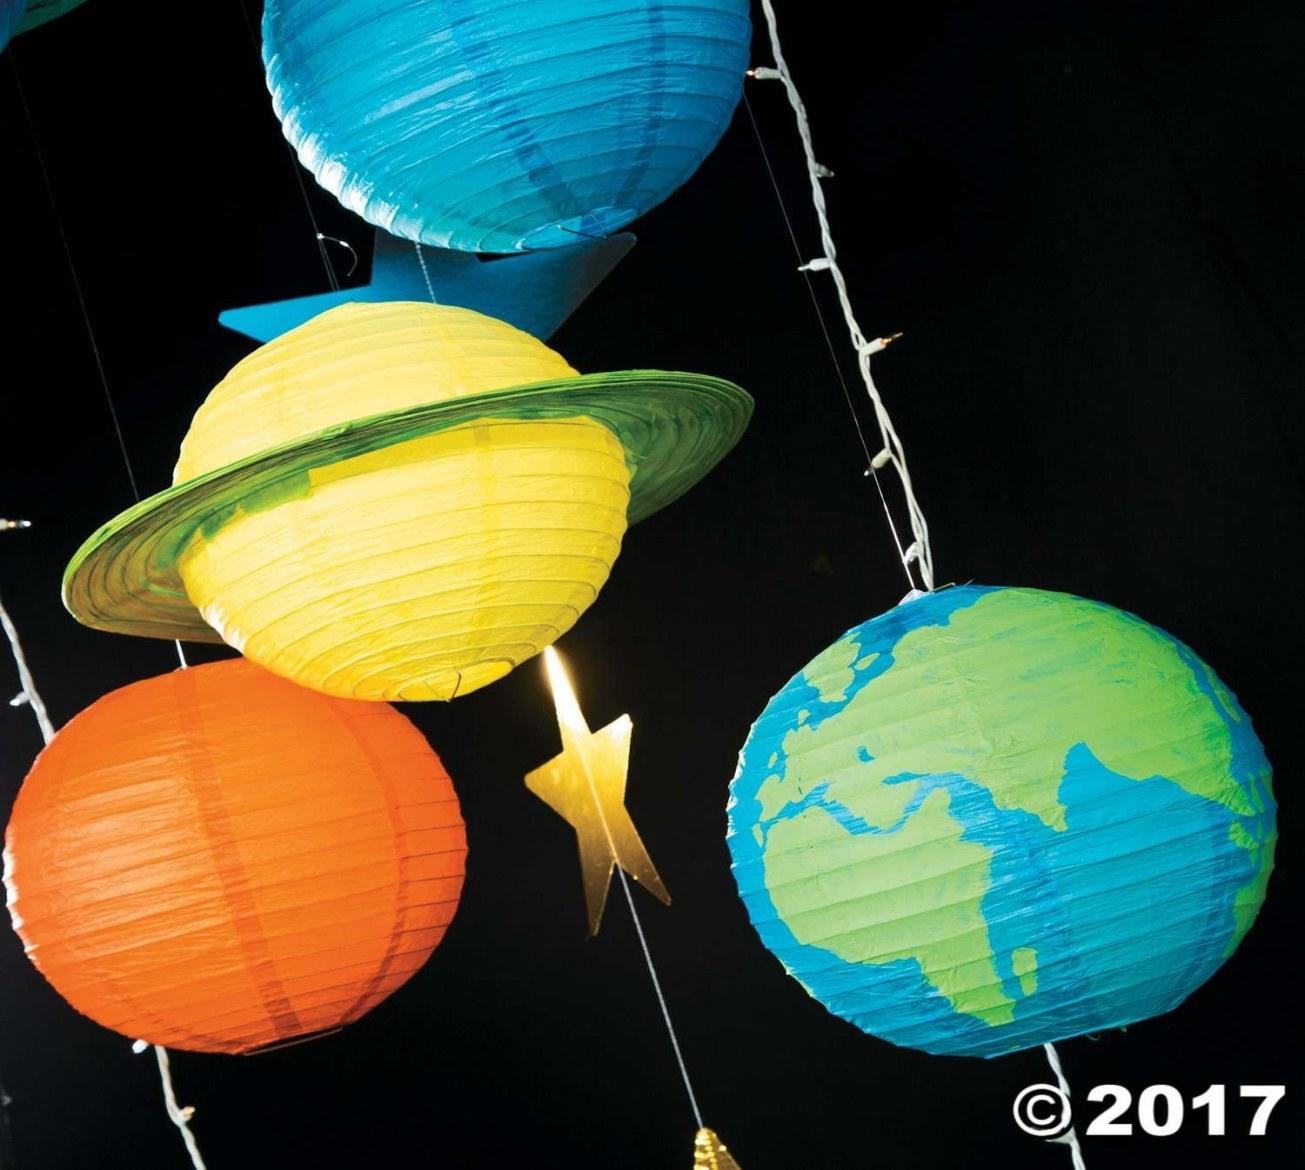 diy birthday party ideas lantern decoration ideas elegant boat centerpieces 0d design of diy birthday party ideas